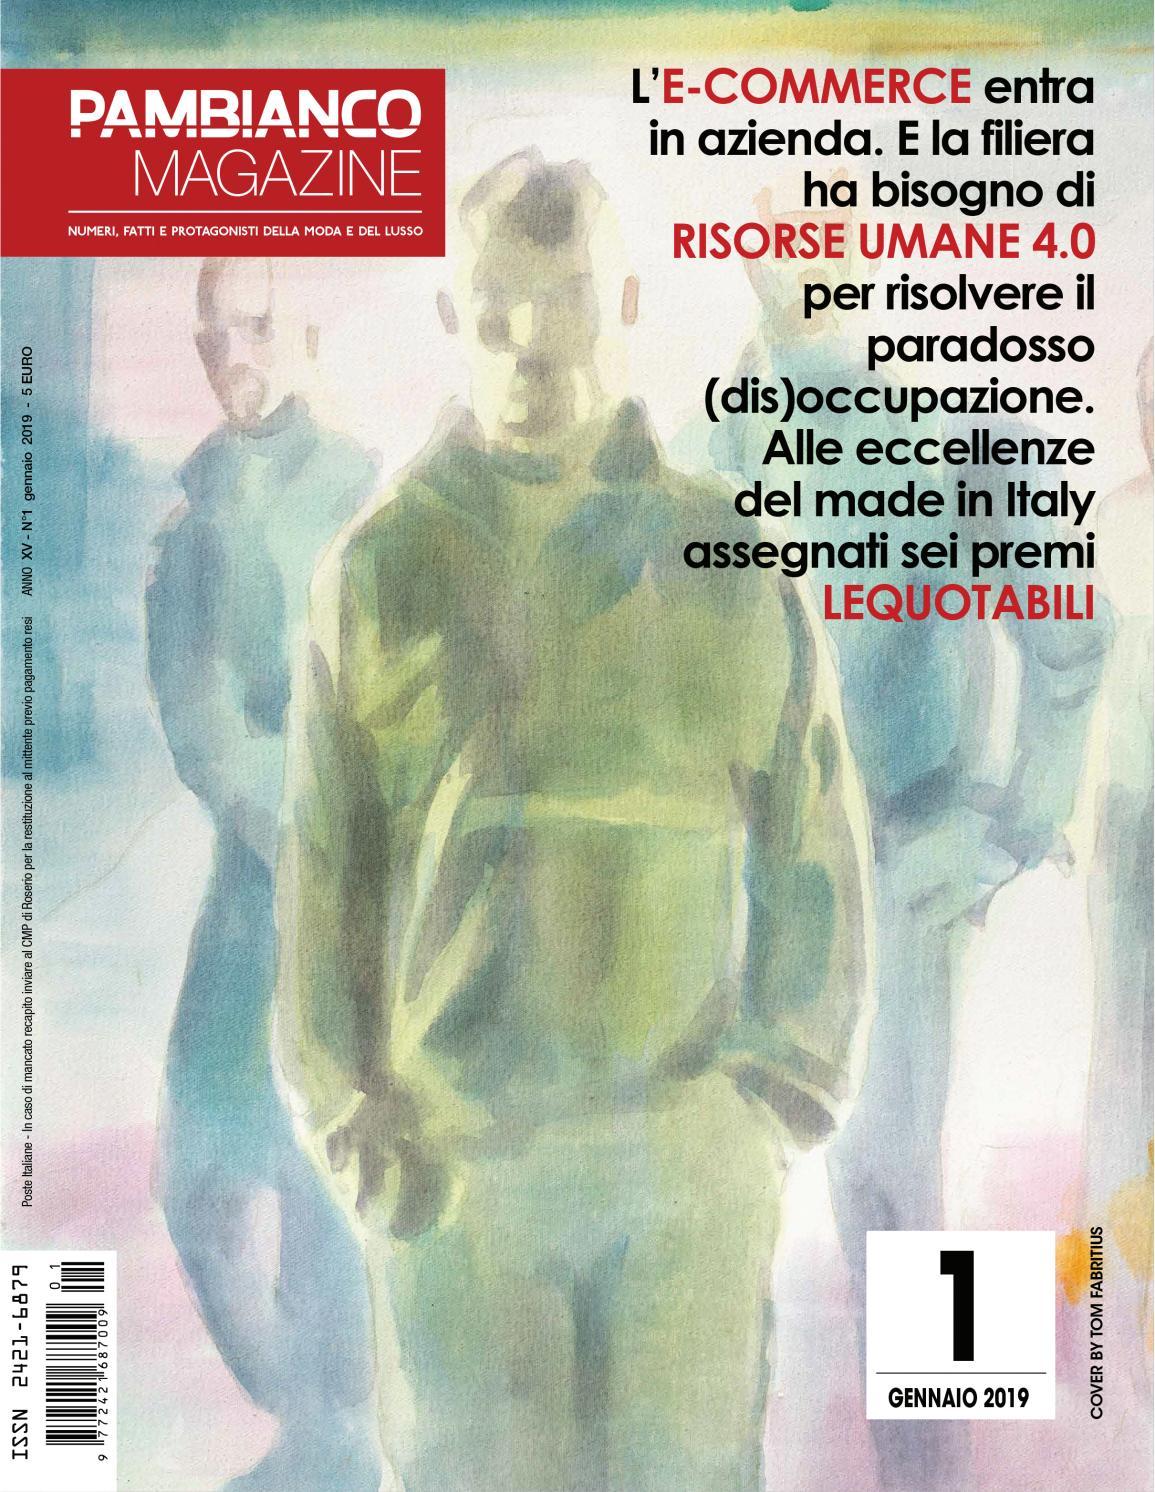 c04a1ea250 Pambianco magazine n1/2019 by Pambianconews - issuu